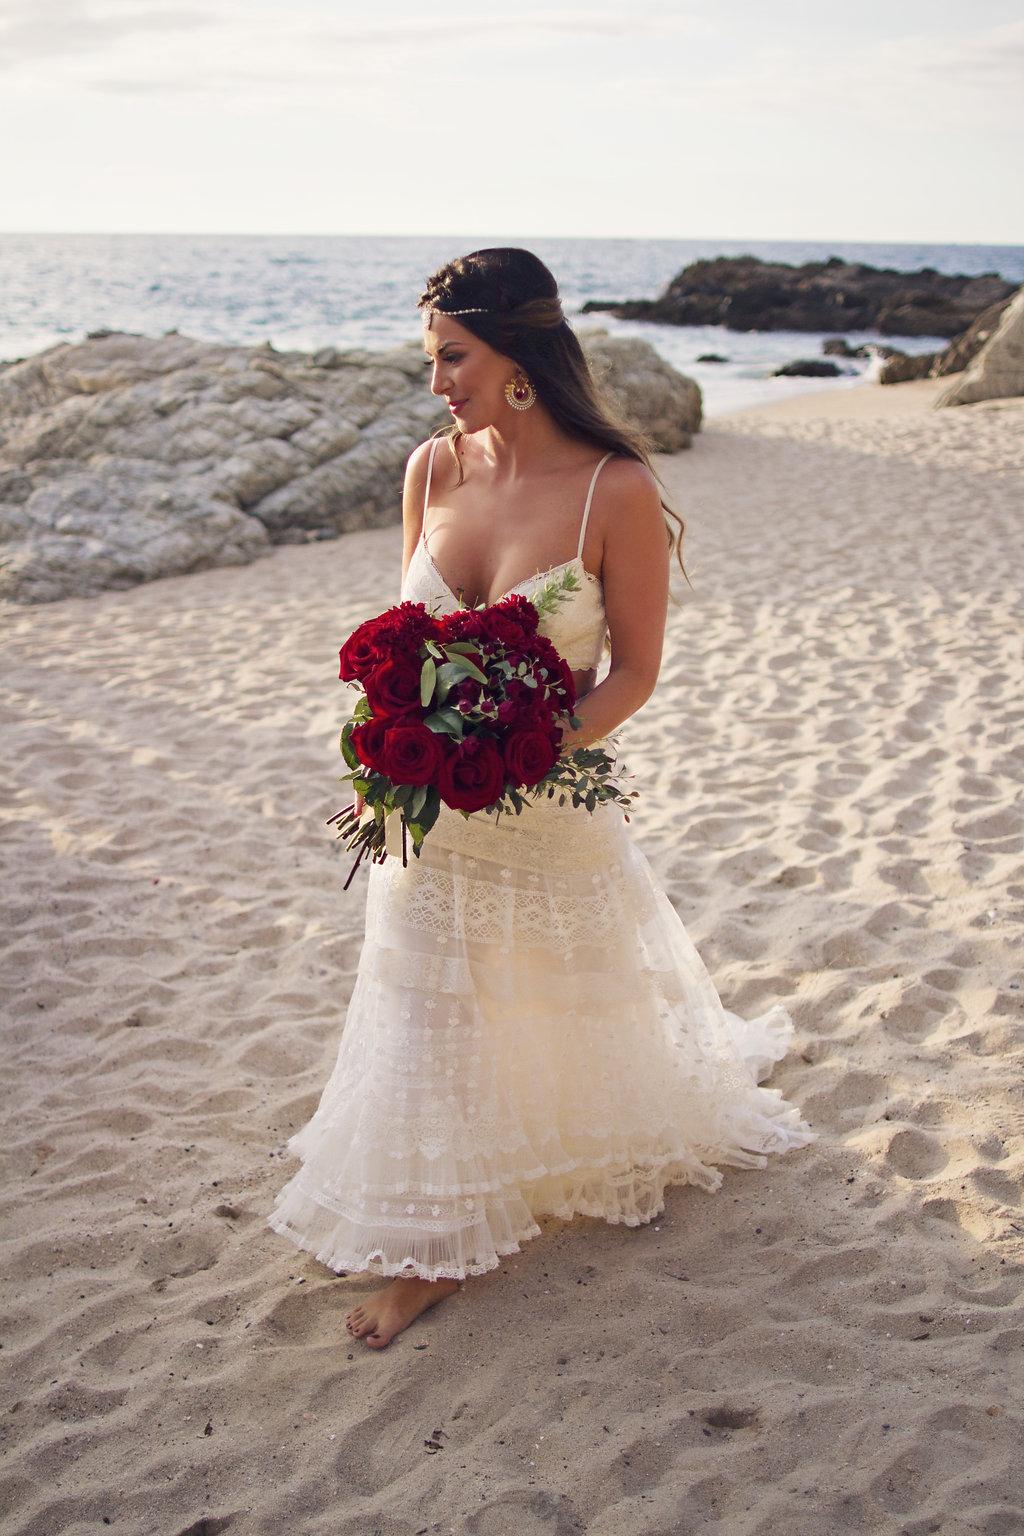 Beach Wedding Mexico Location Locations Destinations Ideas Dresses